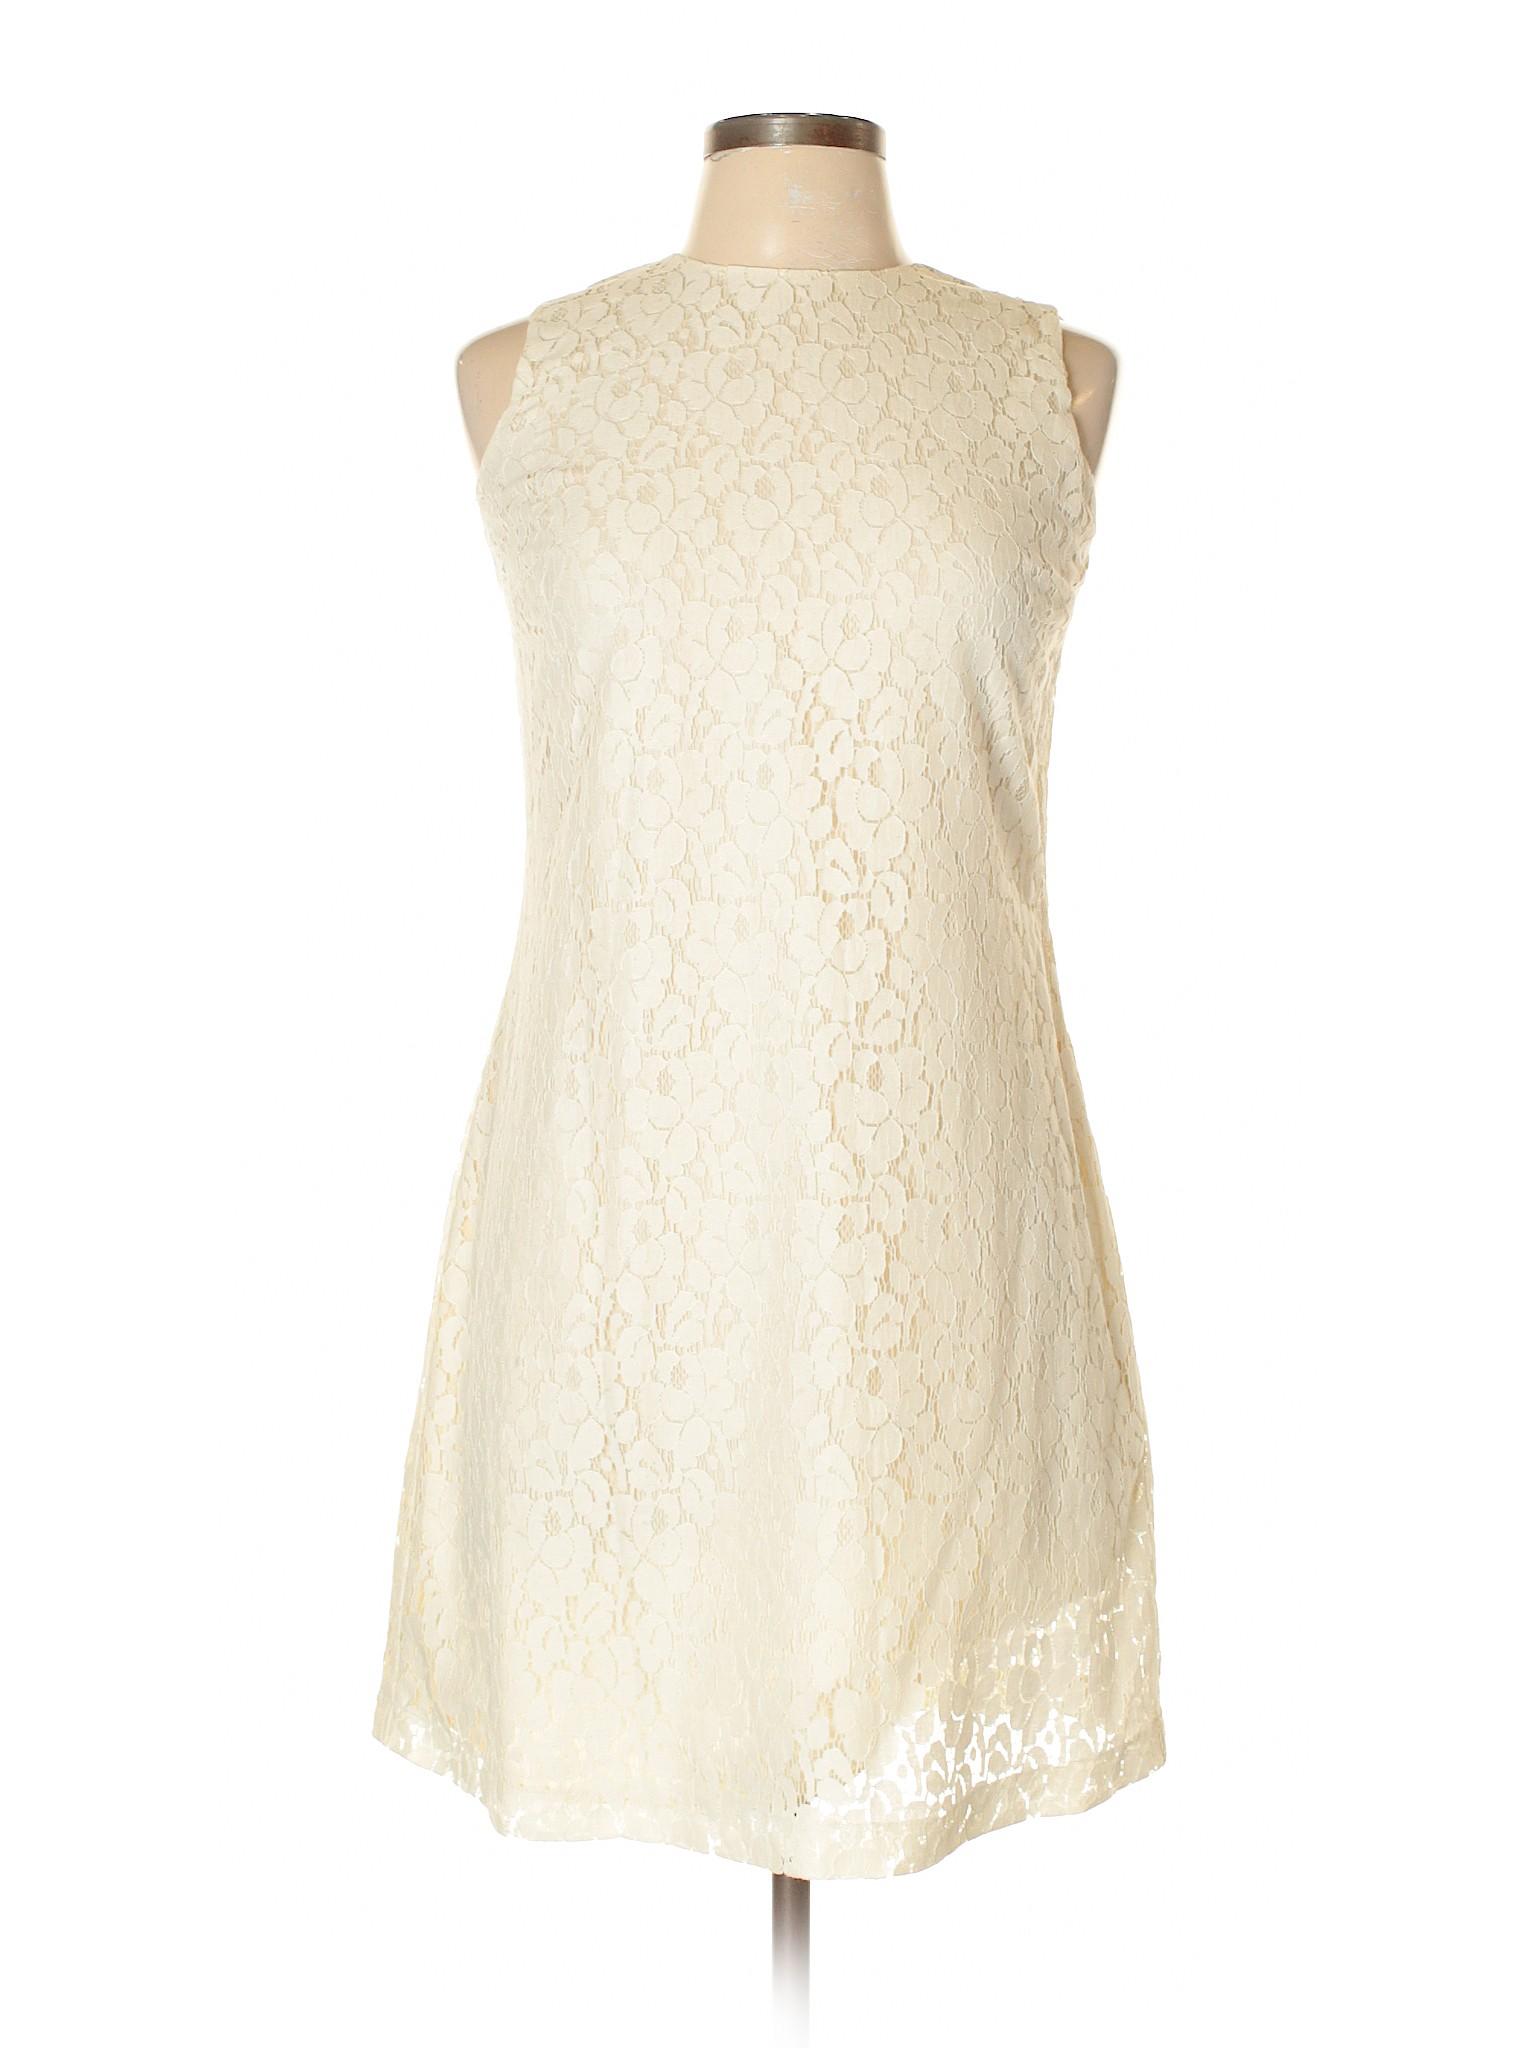 Tabitha Selling Tabitha Casual Dress Selling Casual Dress qHSFwxZRn